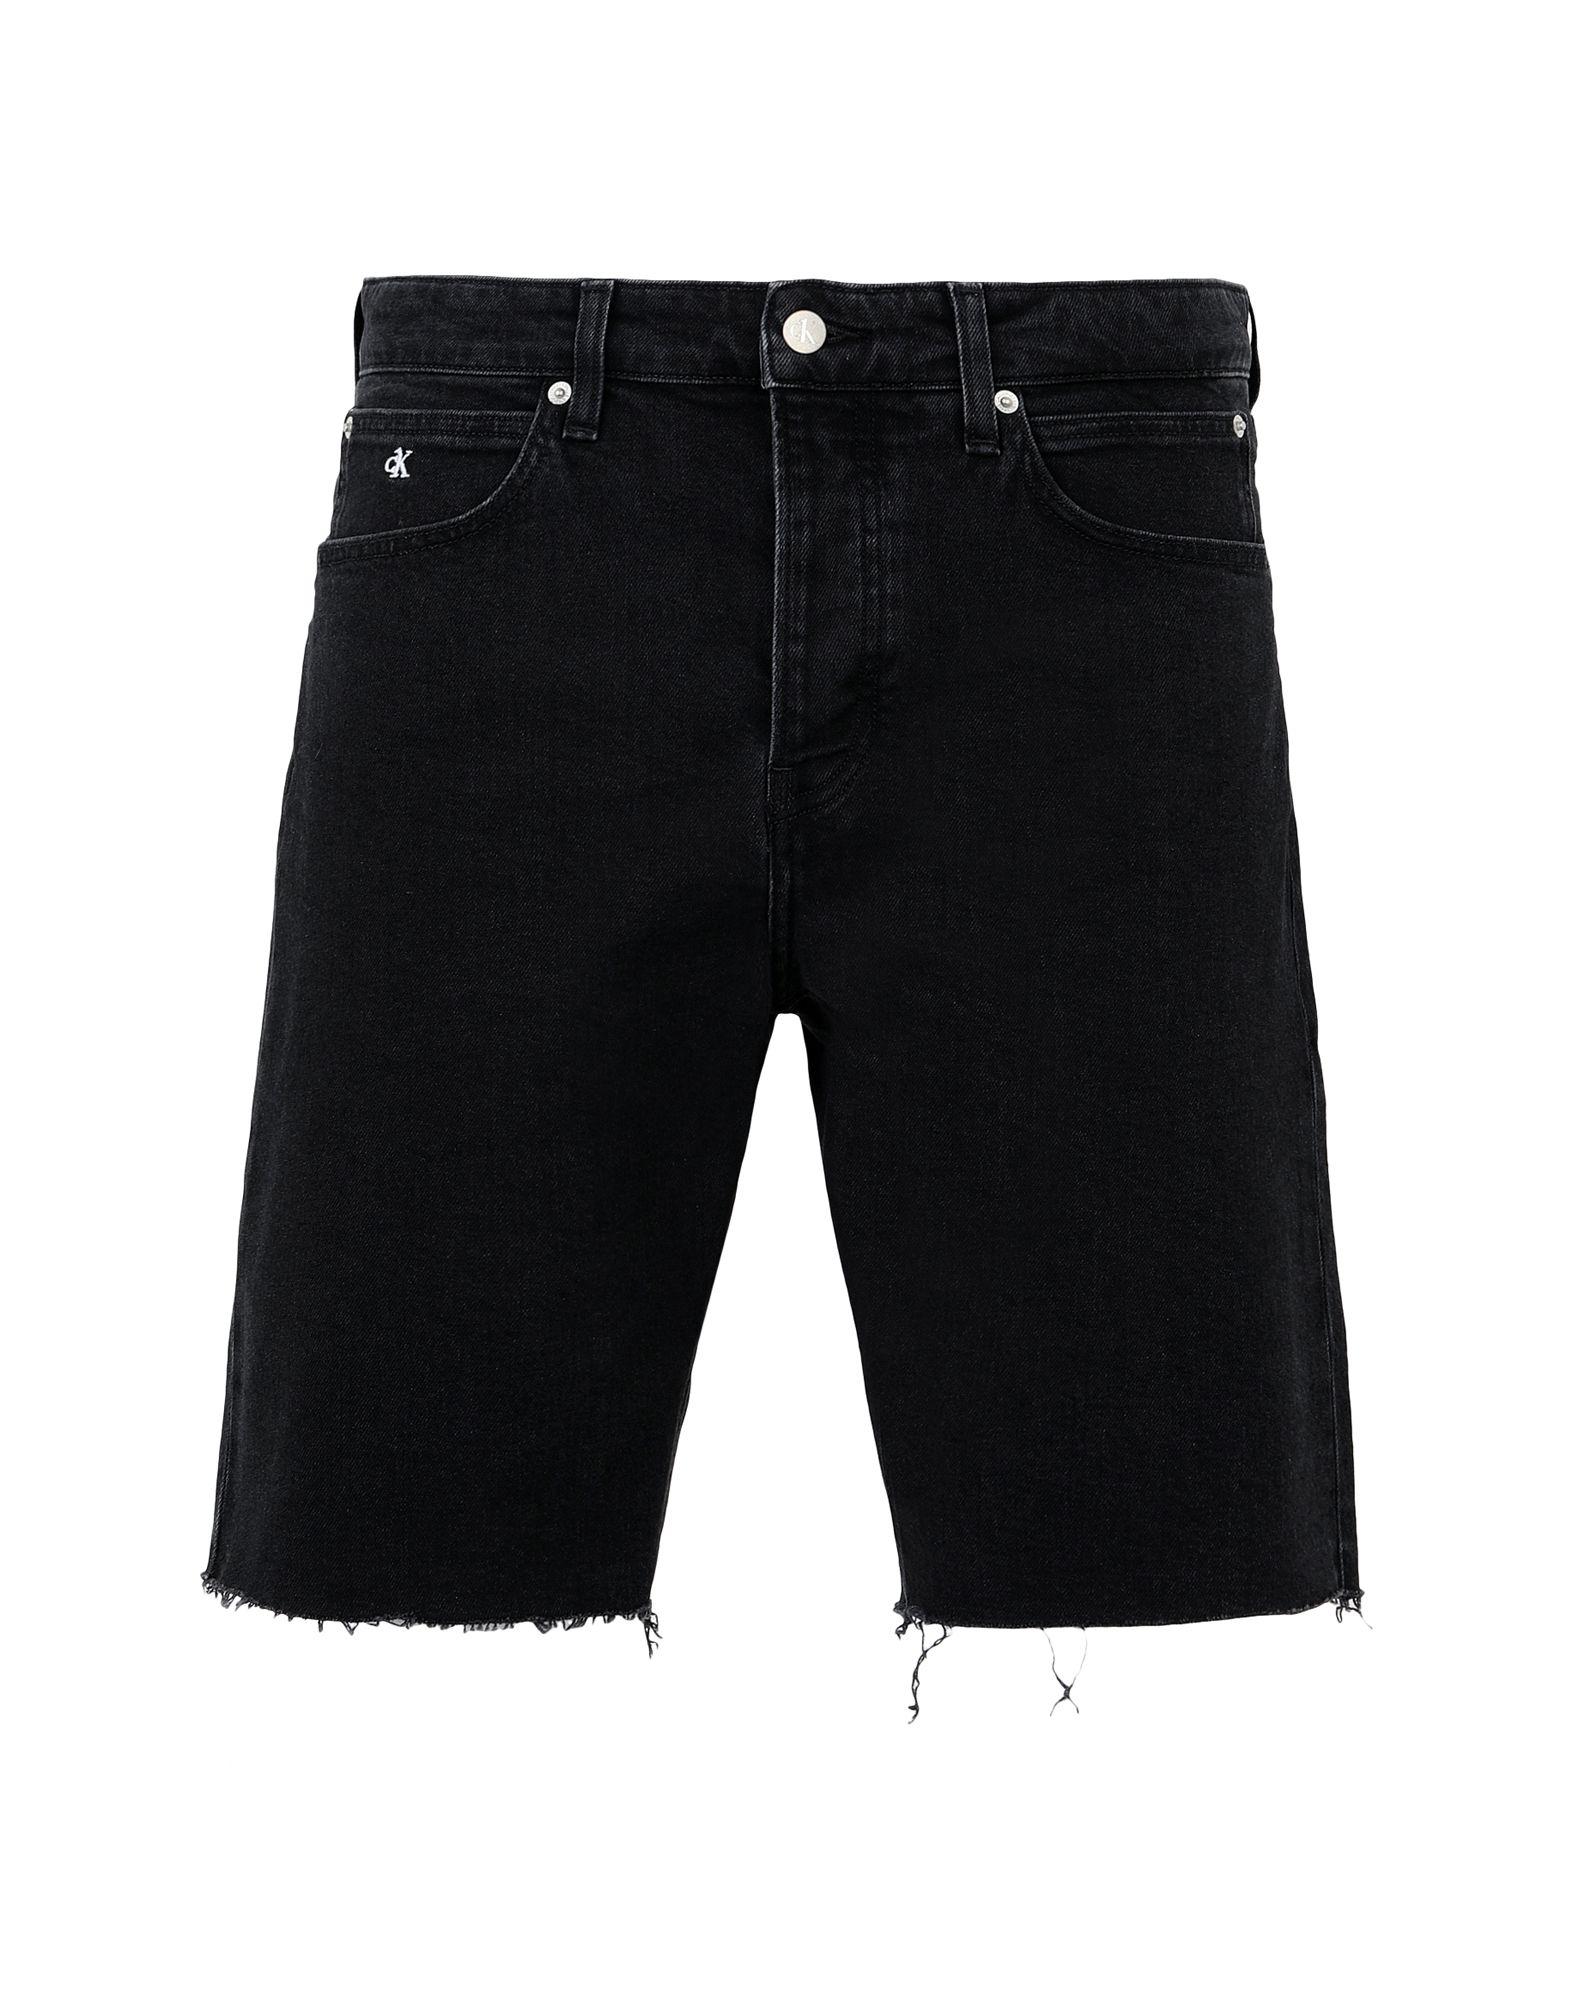 Фото - CALVIN KLEIN JEANS Джинсовые шорты please джинсовые шорты